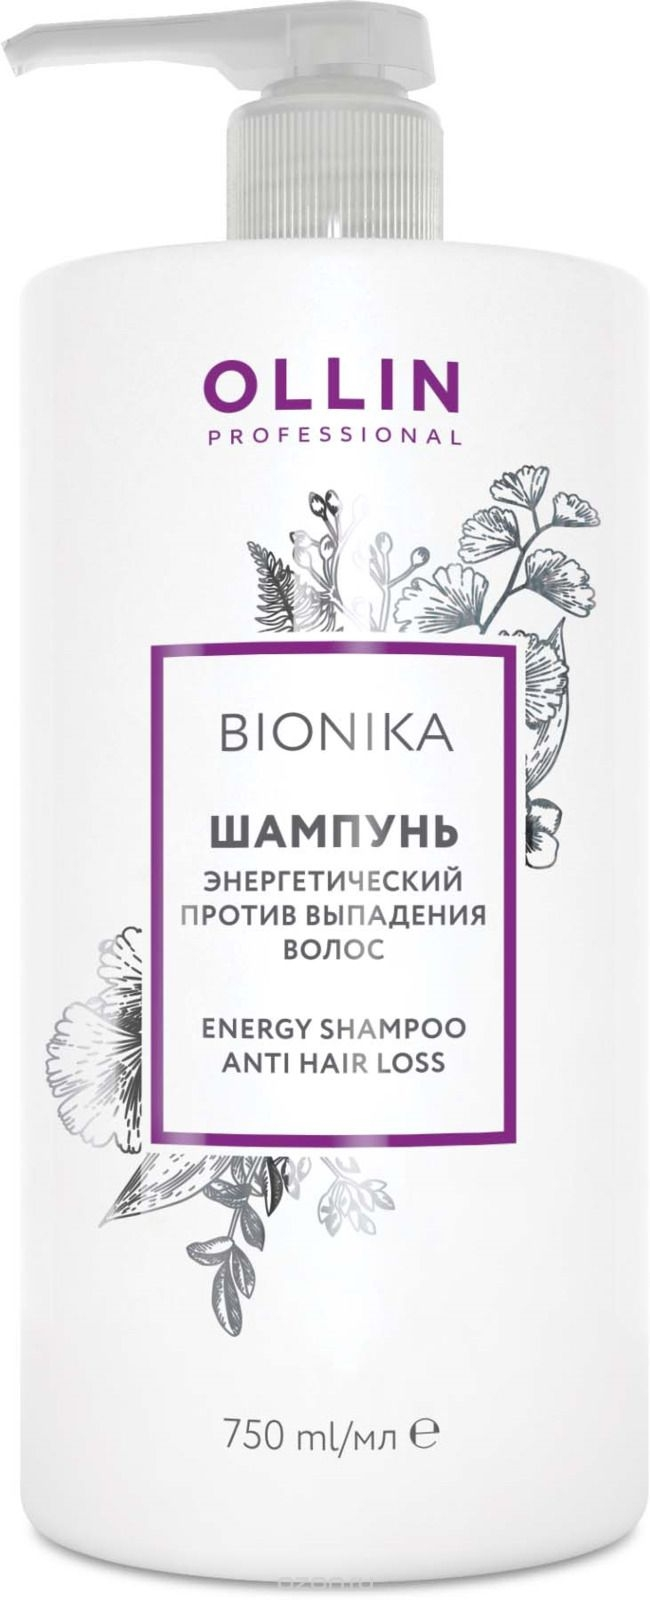 OLLIN PROFESSIONAL Шампунь BioNika Energy Shampoo Anti Hair Loss Энергетический Против Выпадения Волос, 750 мл ollin professional шампунь bionika energy shampoo anti hair loss энергетический против выпадения волос 750 мл